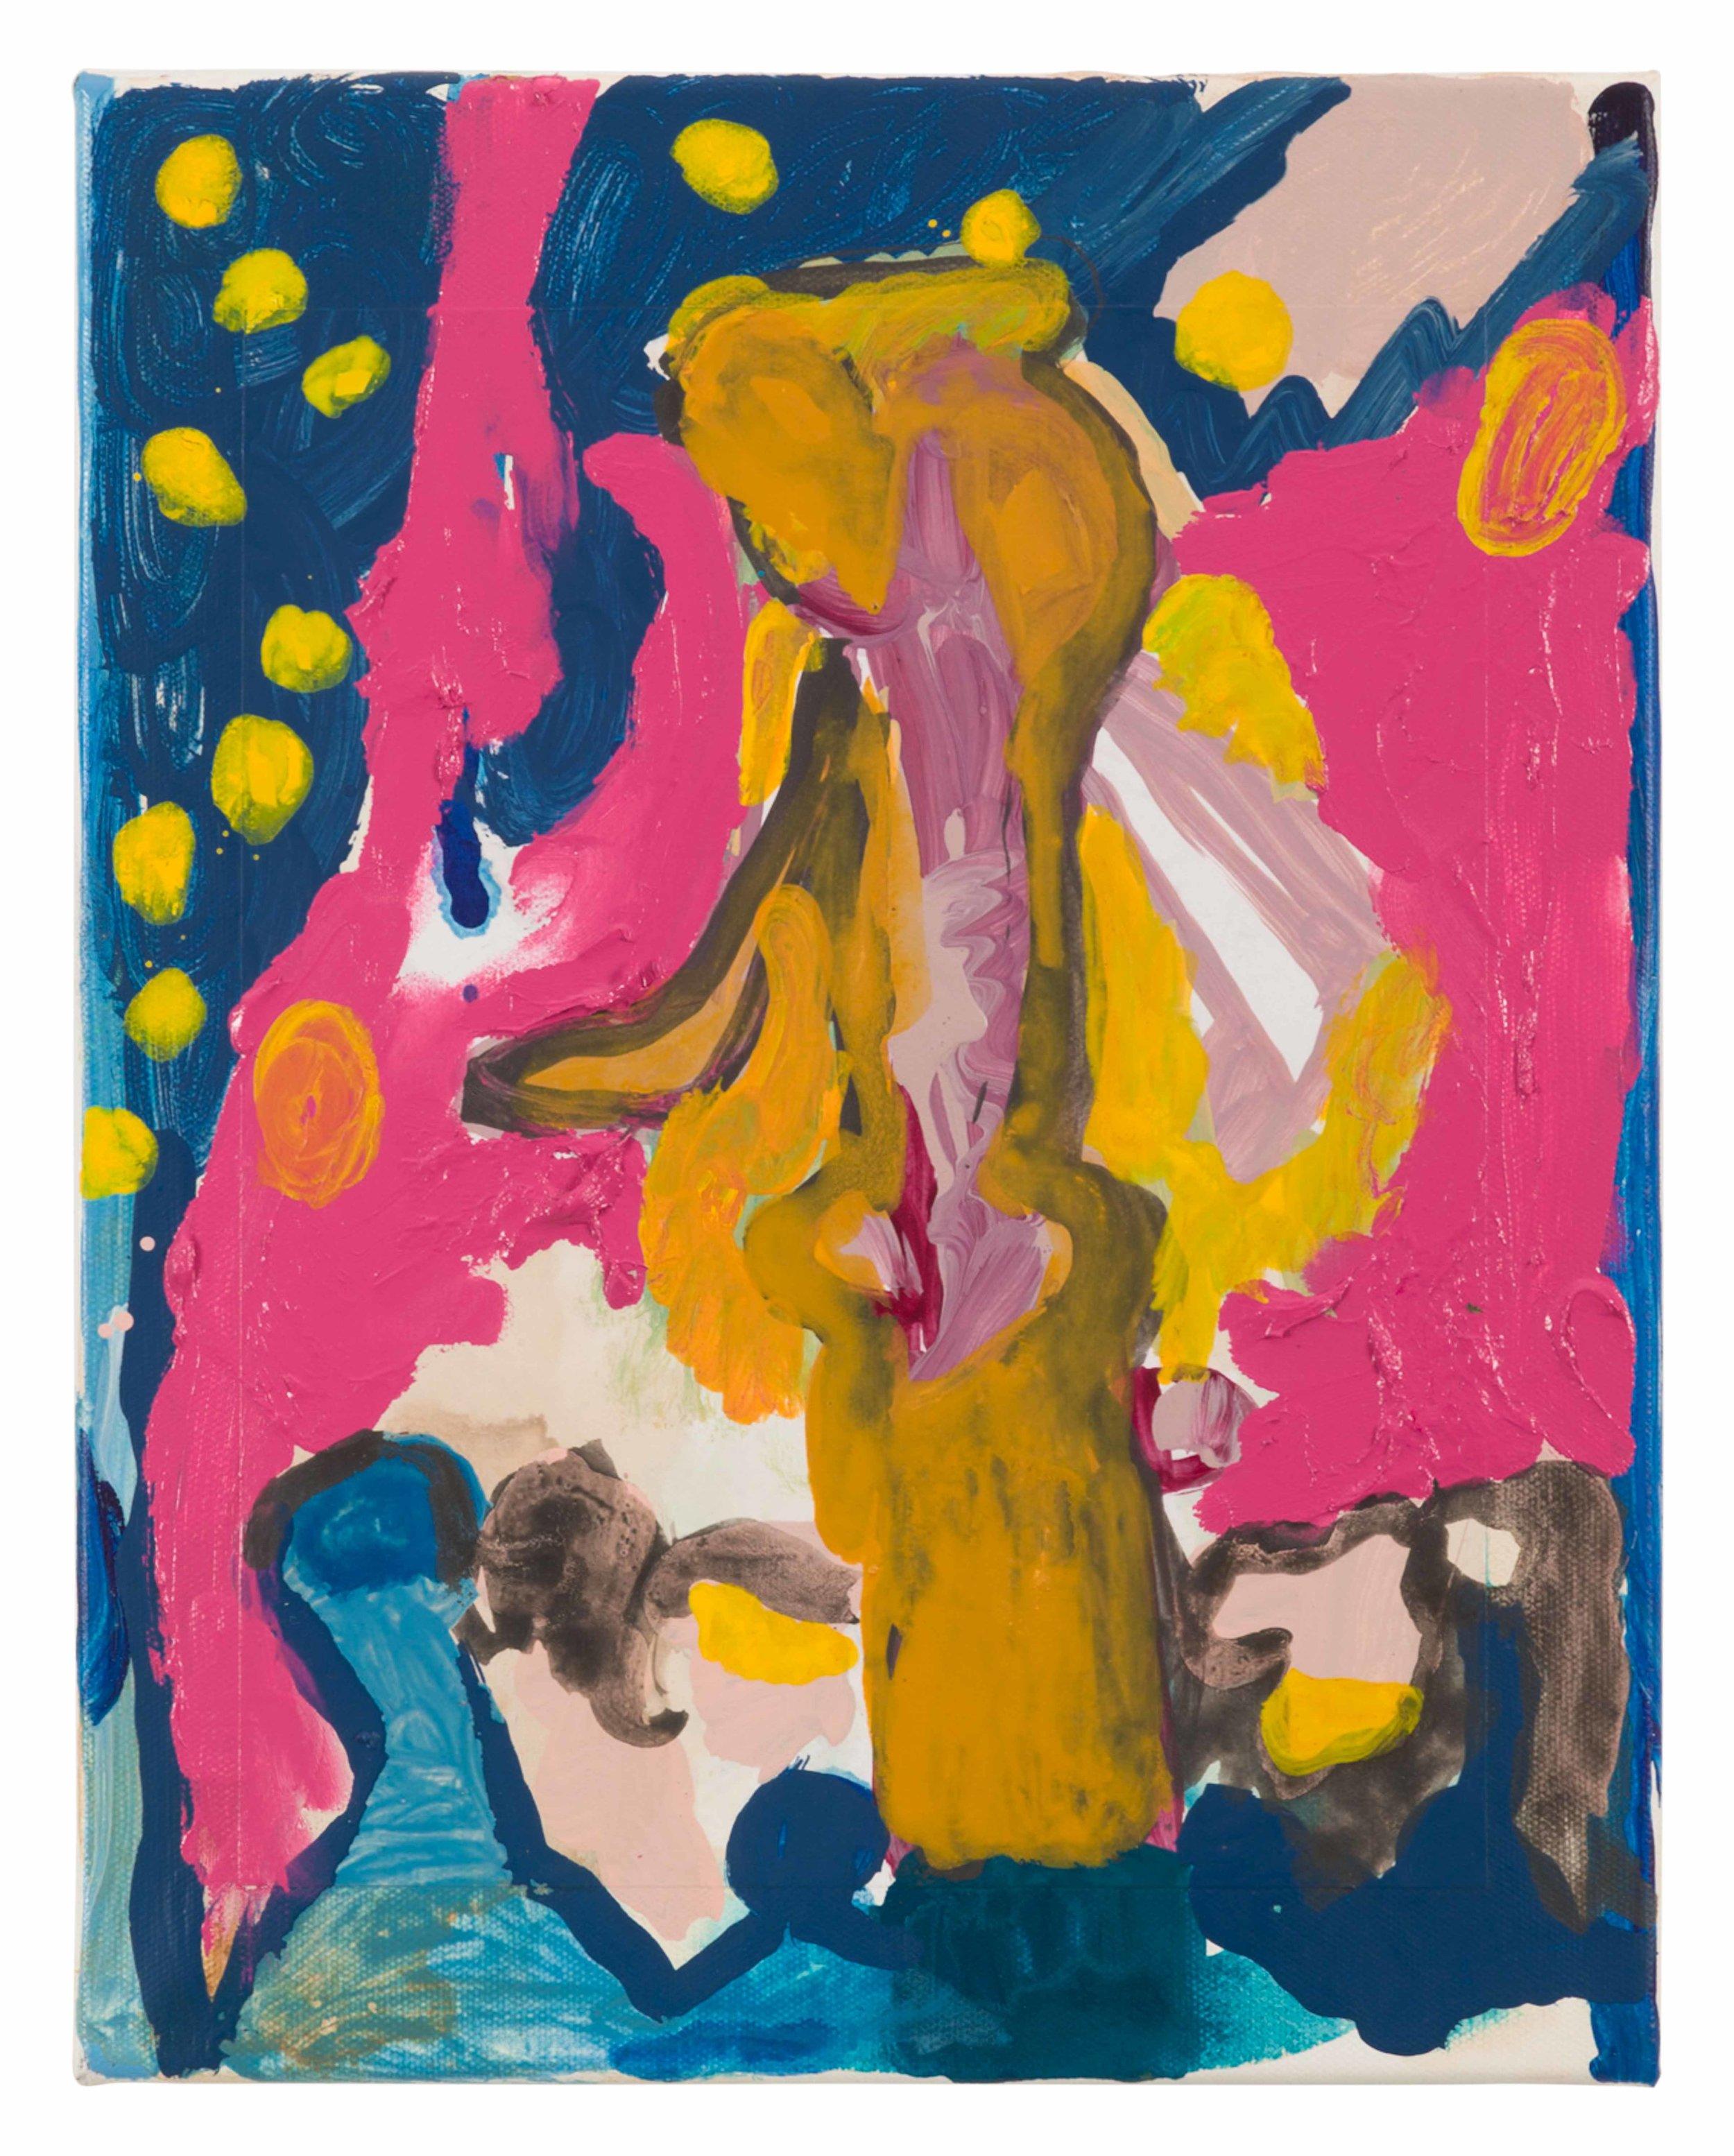 Drew Beattie and Ben Shepard  European Concert  2015 acrylic on canvas 14 x 11 inches